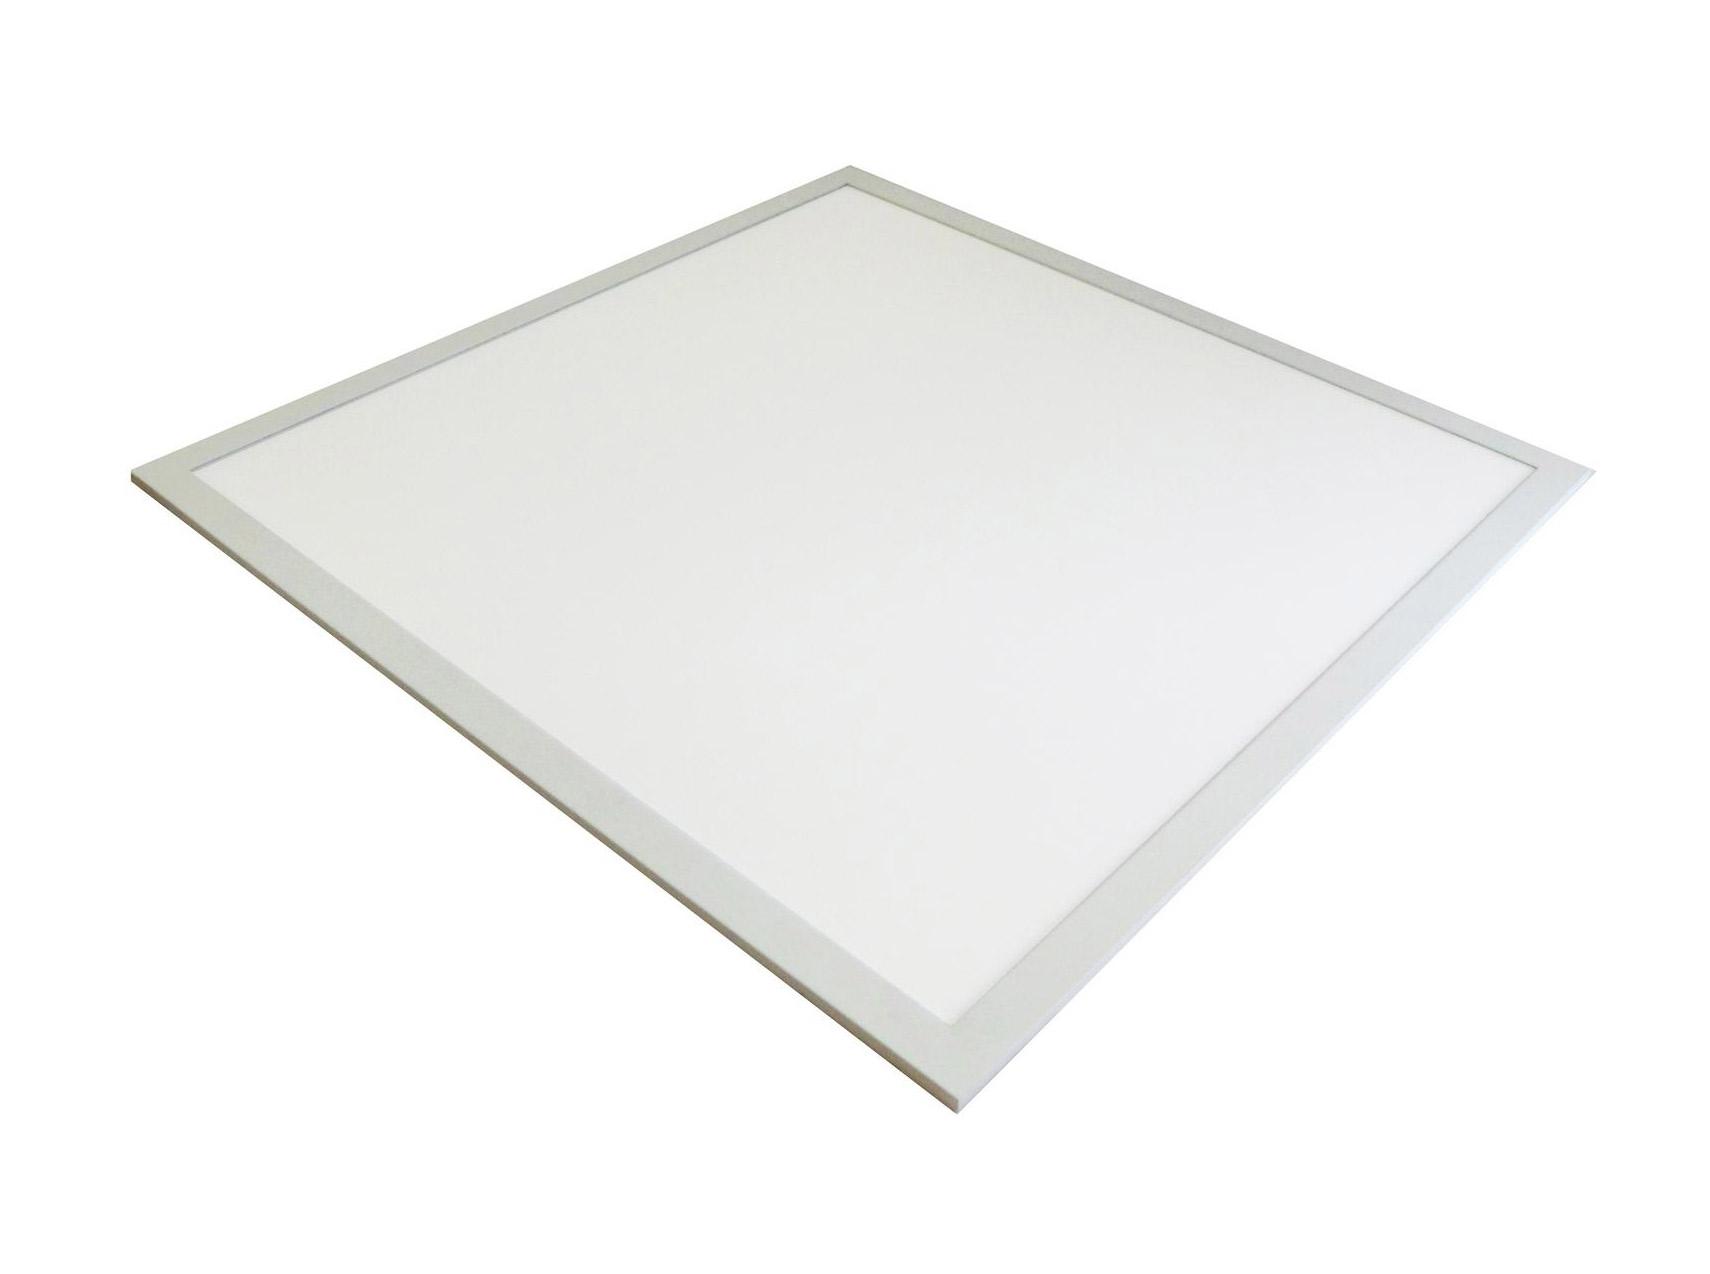 Vrhunski ugradni led paneli poroverenog proiyvodjaca NVC lighting